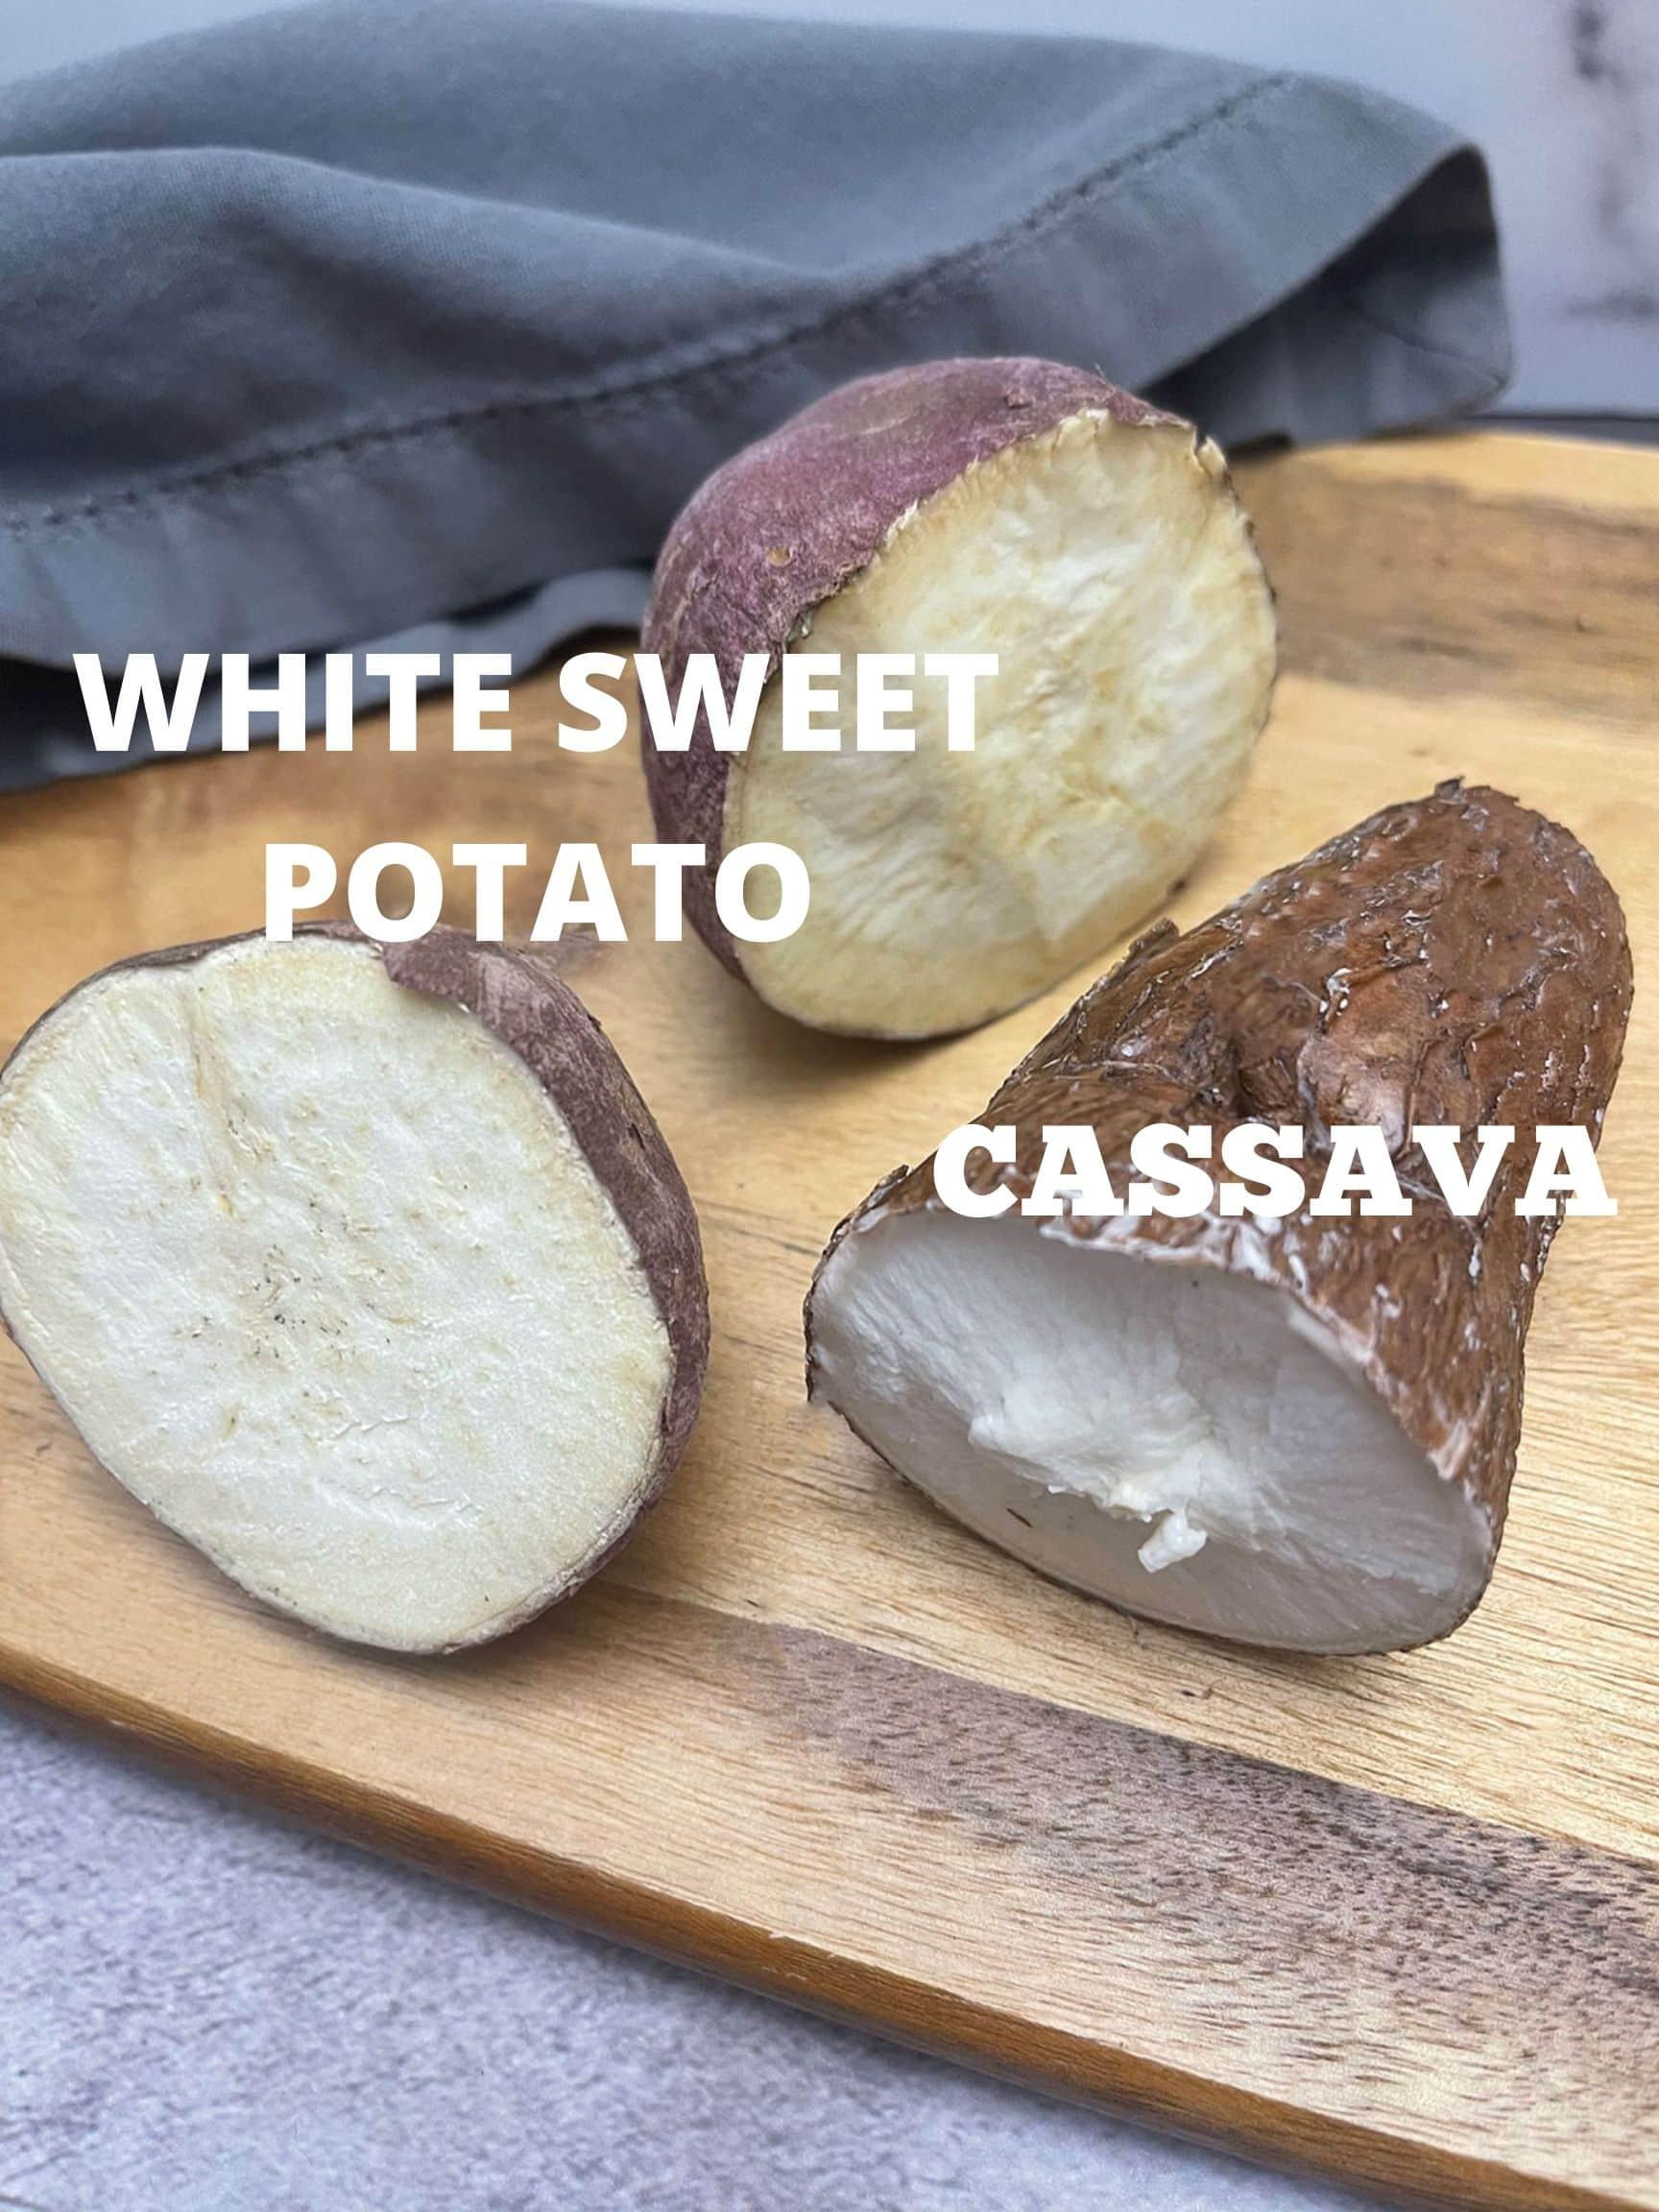 sweet potato and cassava on cutting board